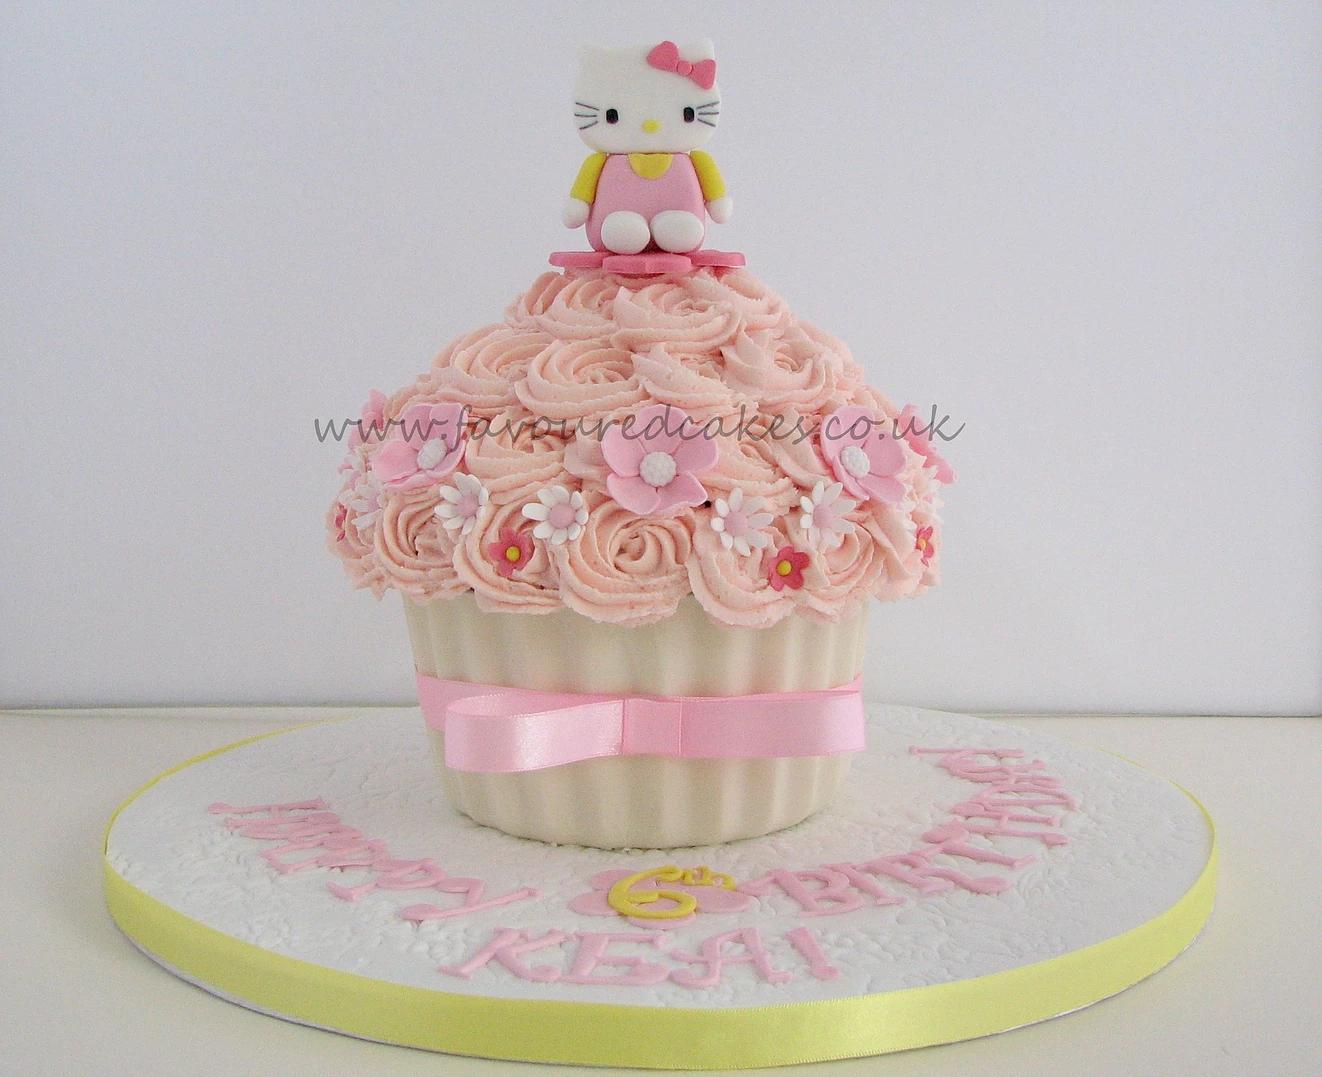 Giant Hello Kitty Cupcake HK02